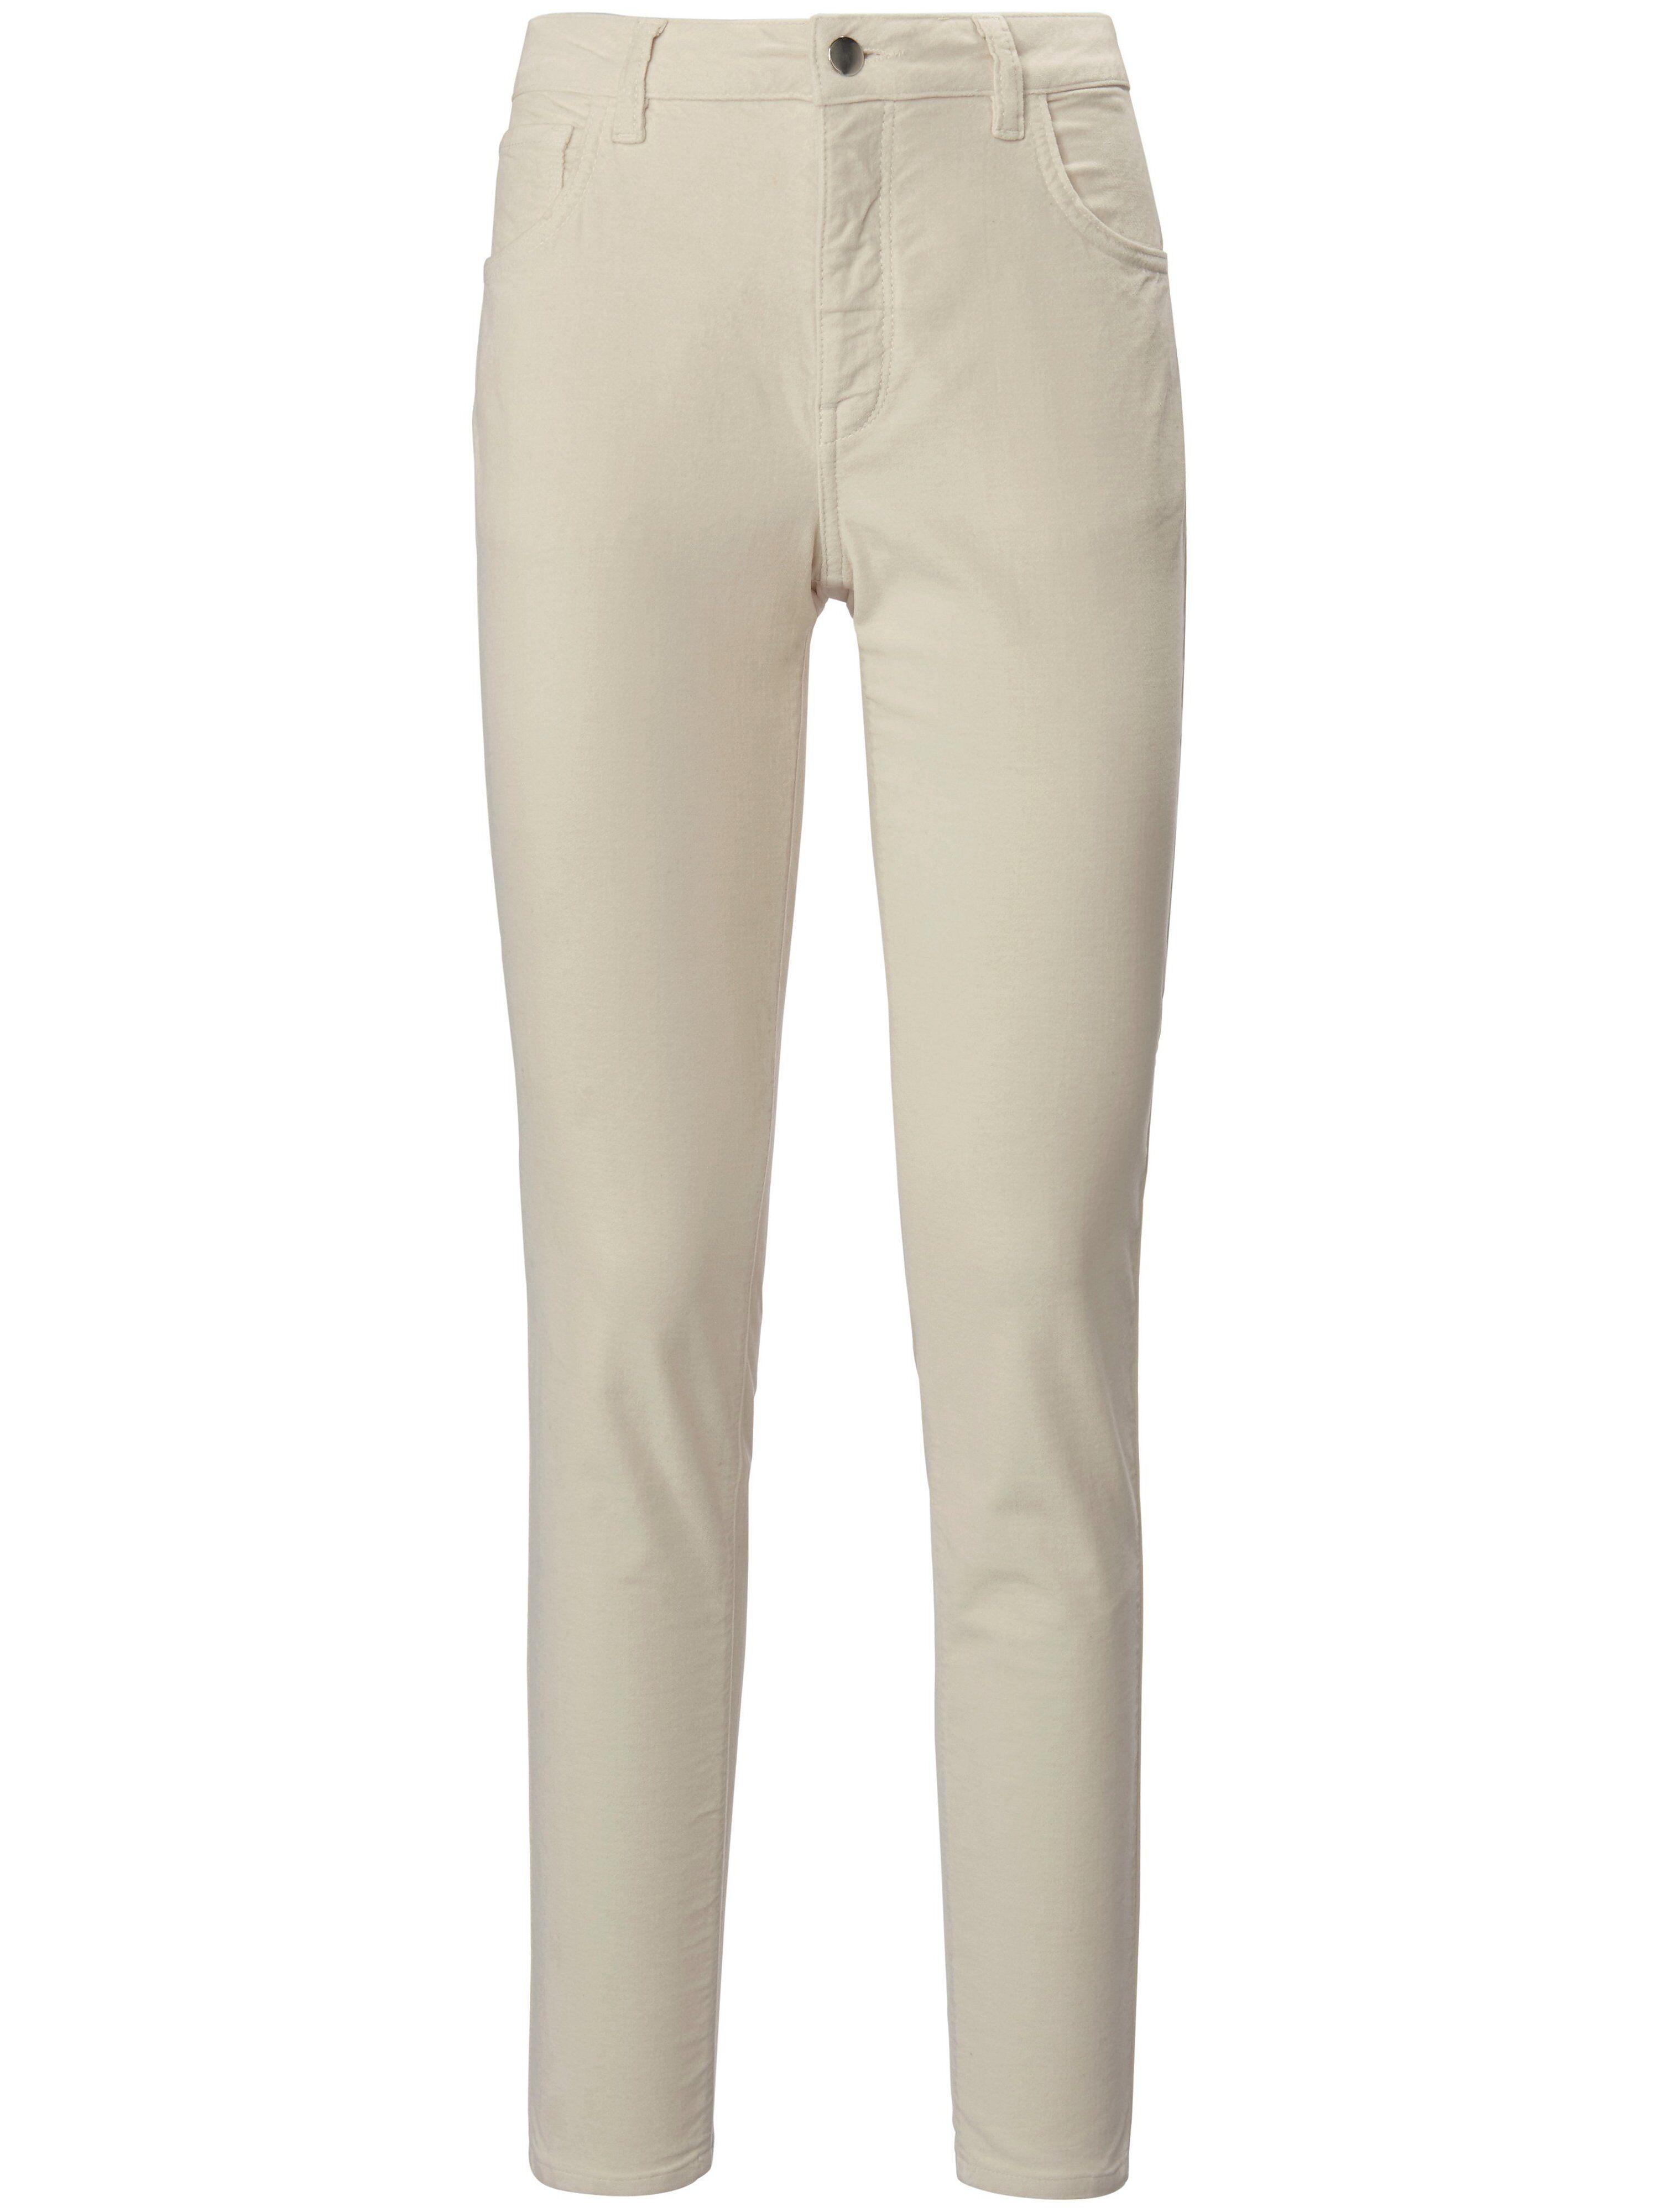 Uta Raasch Le pantalon ligne 5 poches  Uta Raasch beige  - Femme - 19